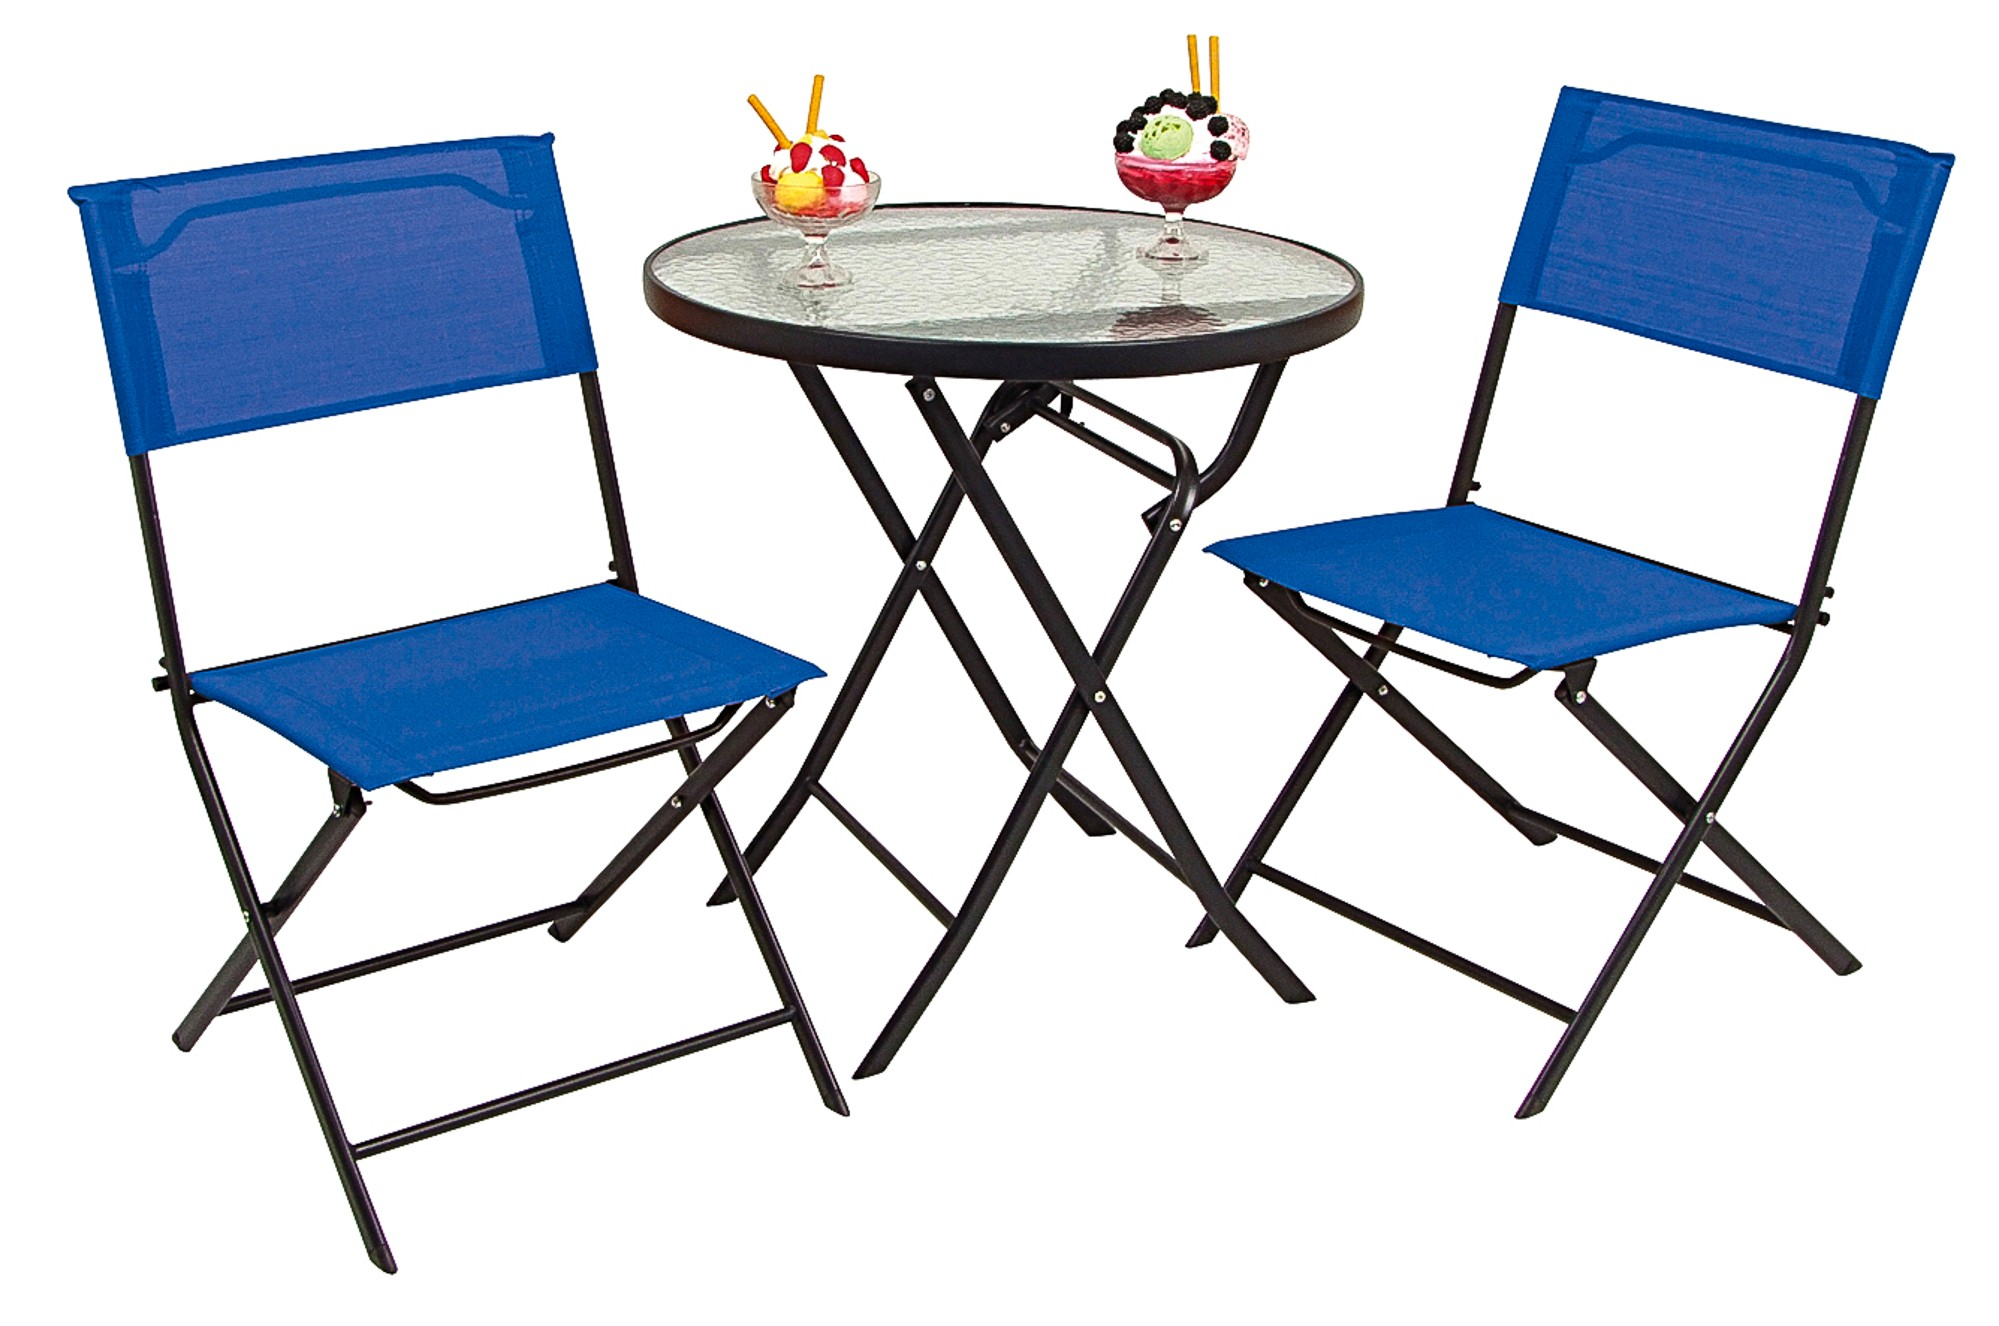 Bistro-Set-3tlg-de-Balcon-bistroset-asiento-varias-plazas-GRUPO-MESA-sillas